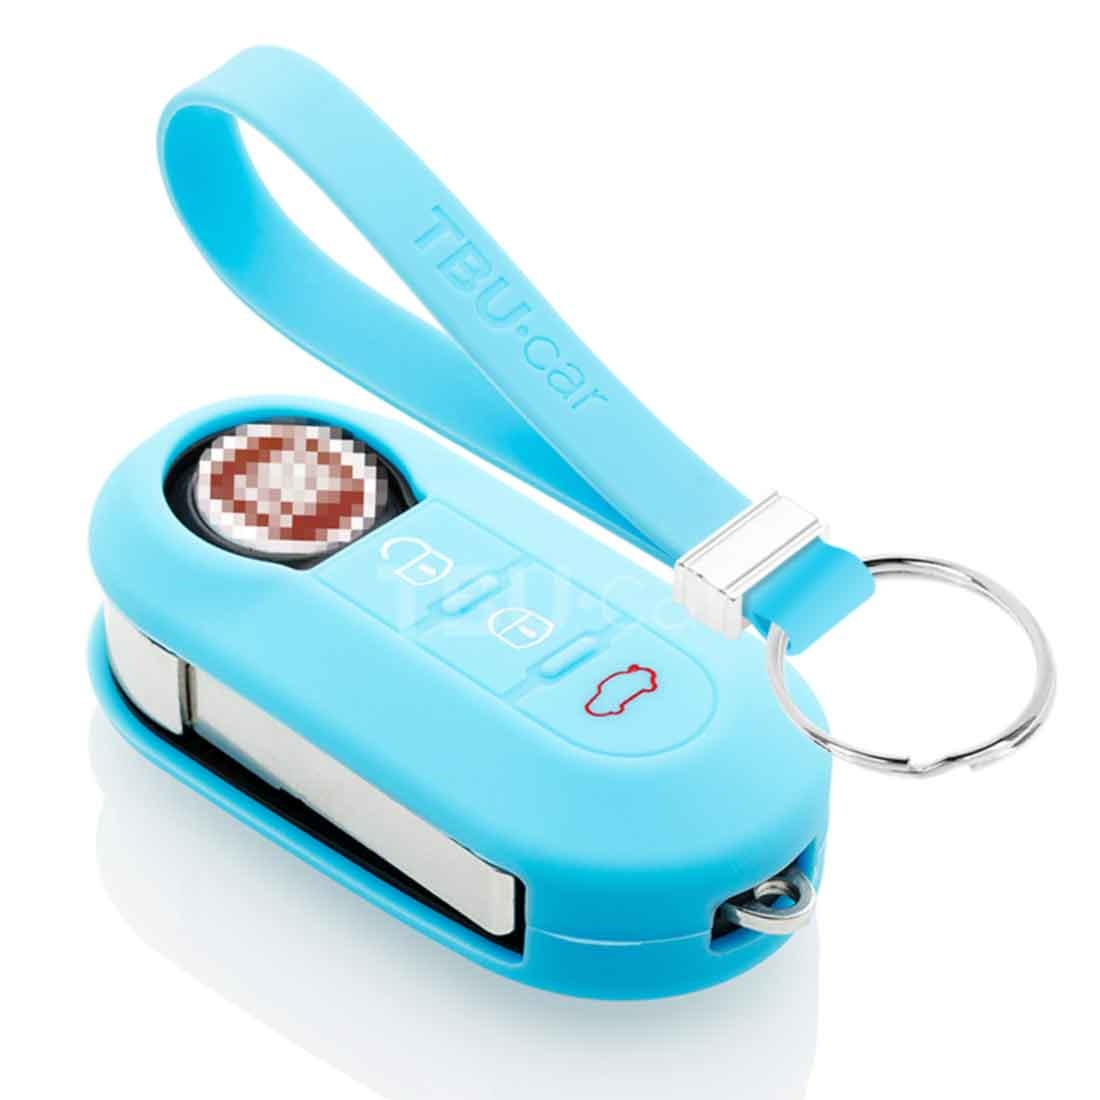 TBU car TBU car Autoschlüssel Hülle kompatibel mit Fiat 3 Tasten - Schutzhülle aus Silikon - Auto Schlüsselhülle Cover in Hellblau